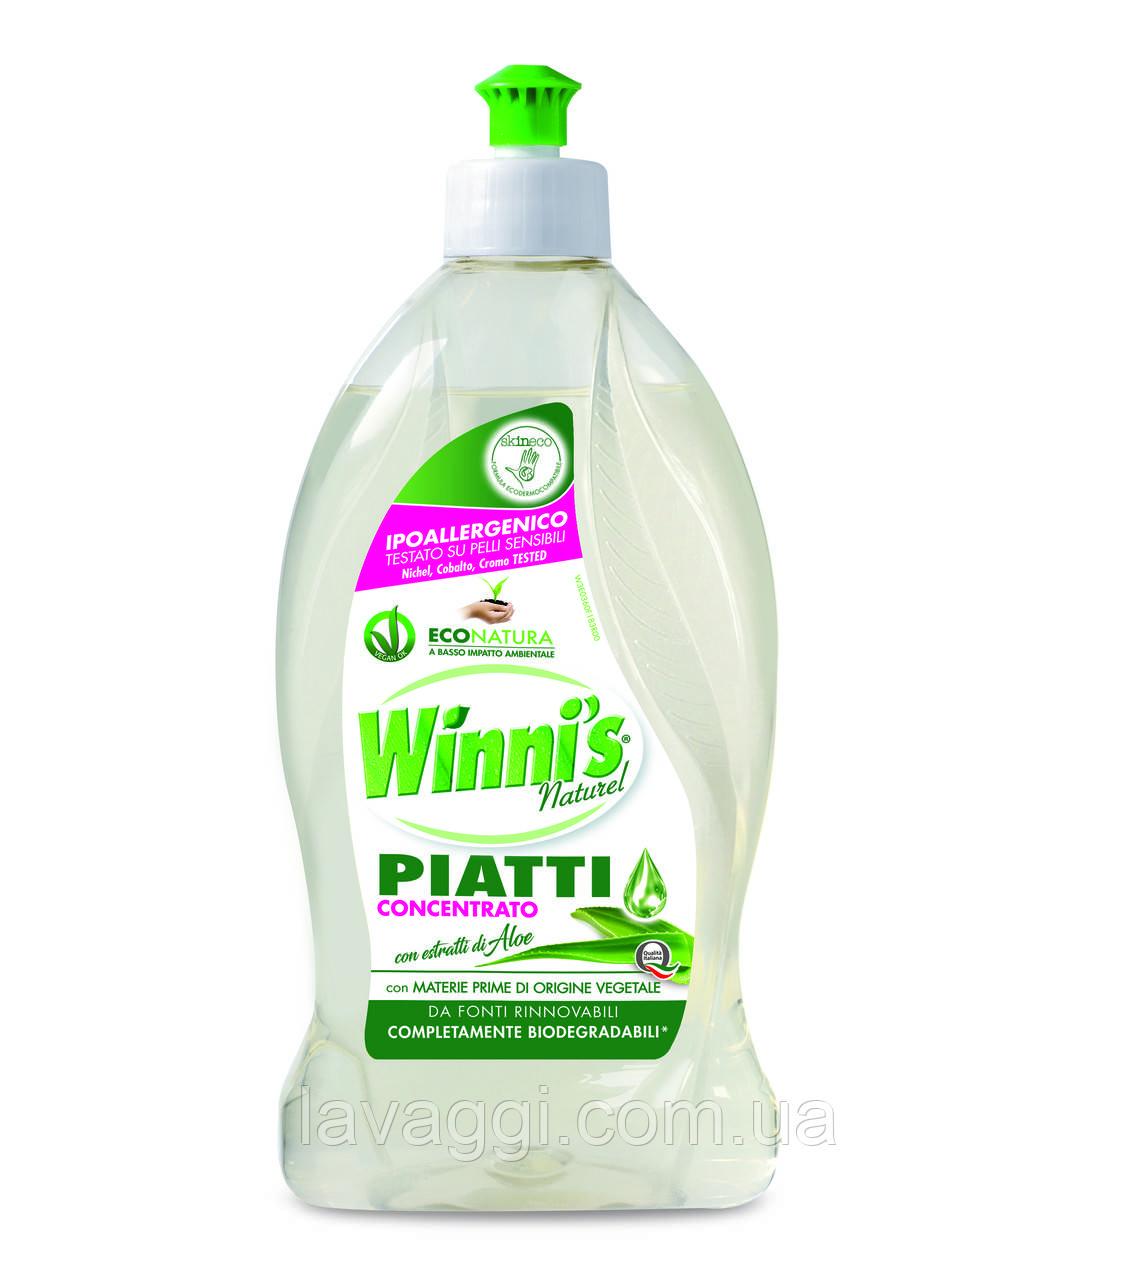 Гипоалергенное концентрированное средство для мытья посуды  Winni's Piatti Concentrato di Aloe 500ml